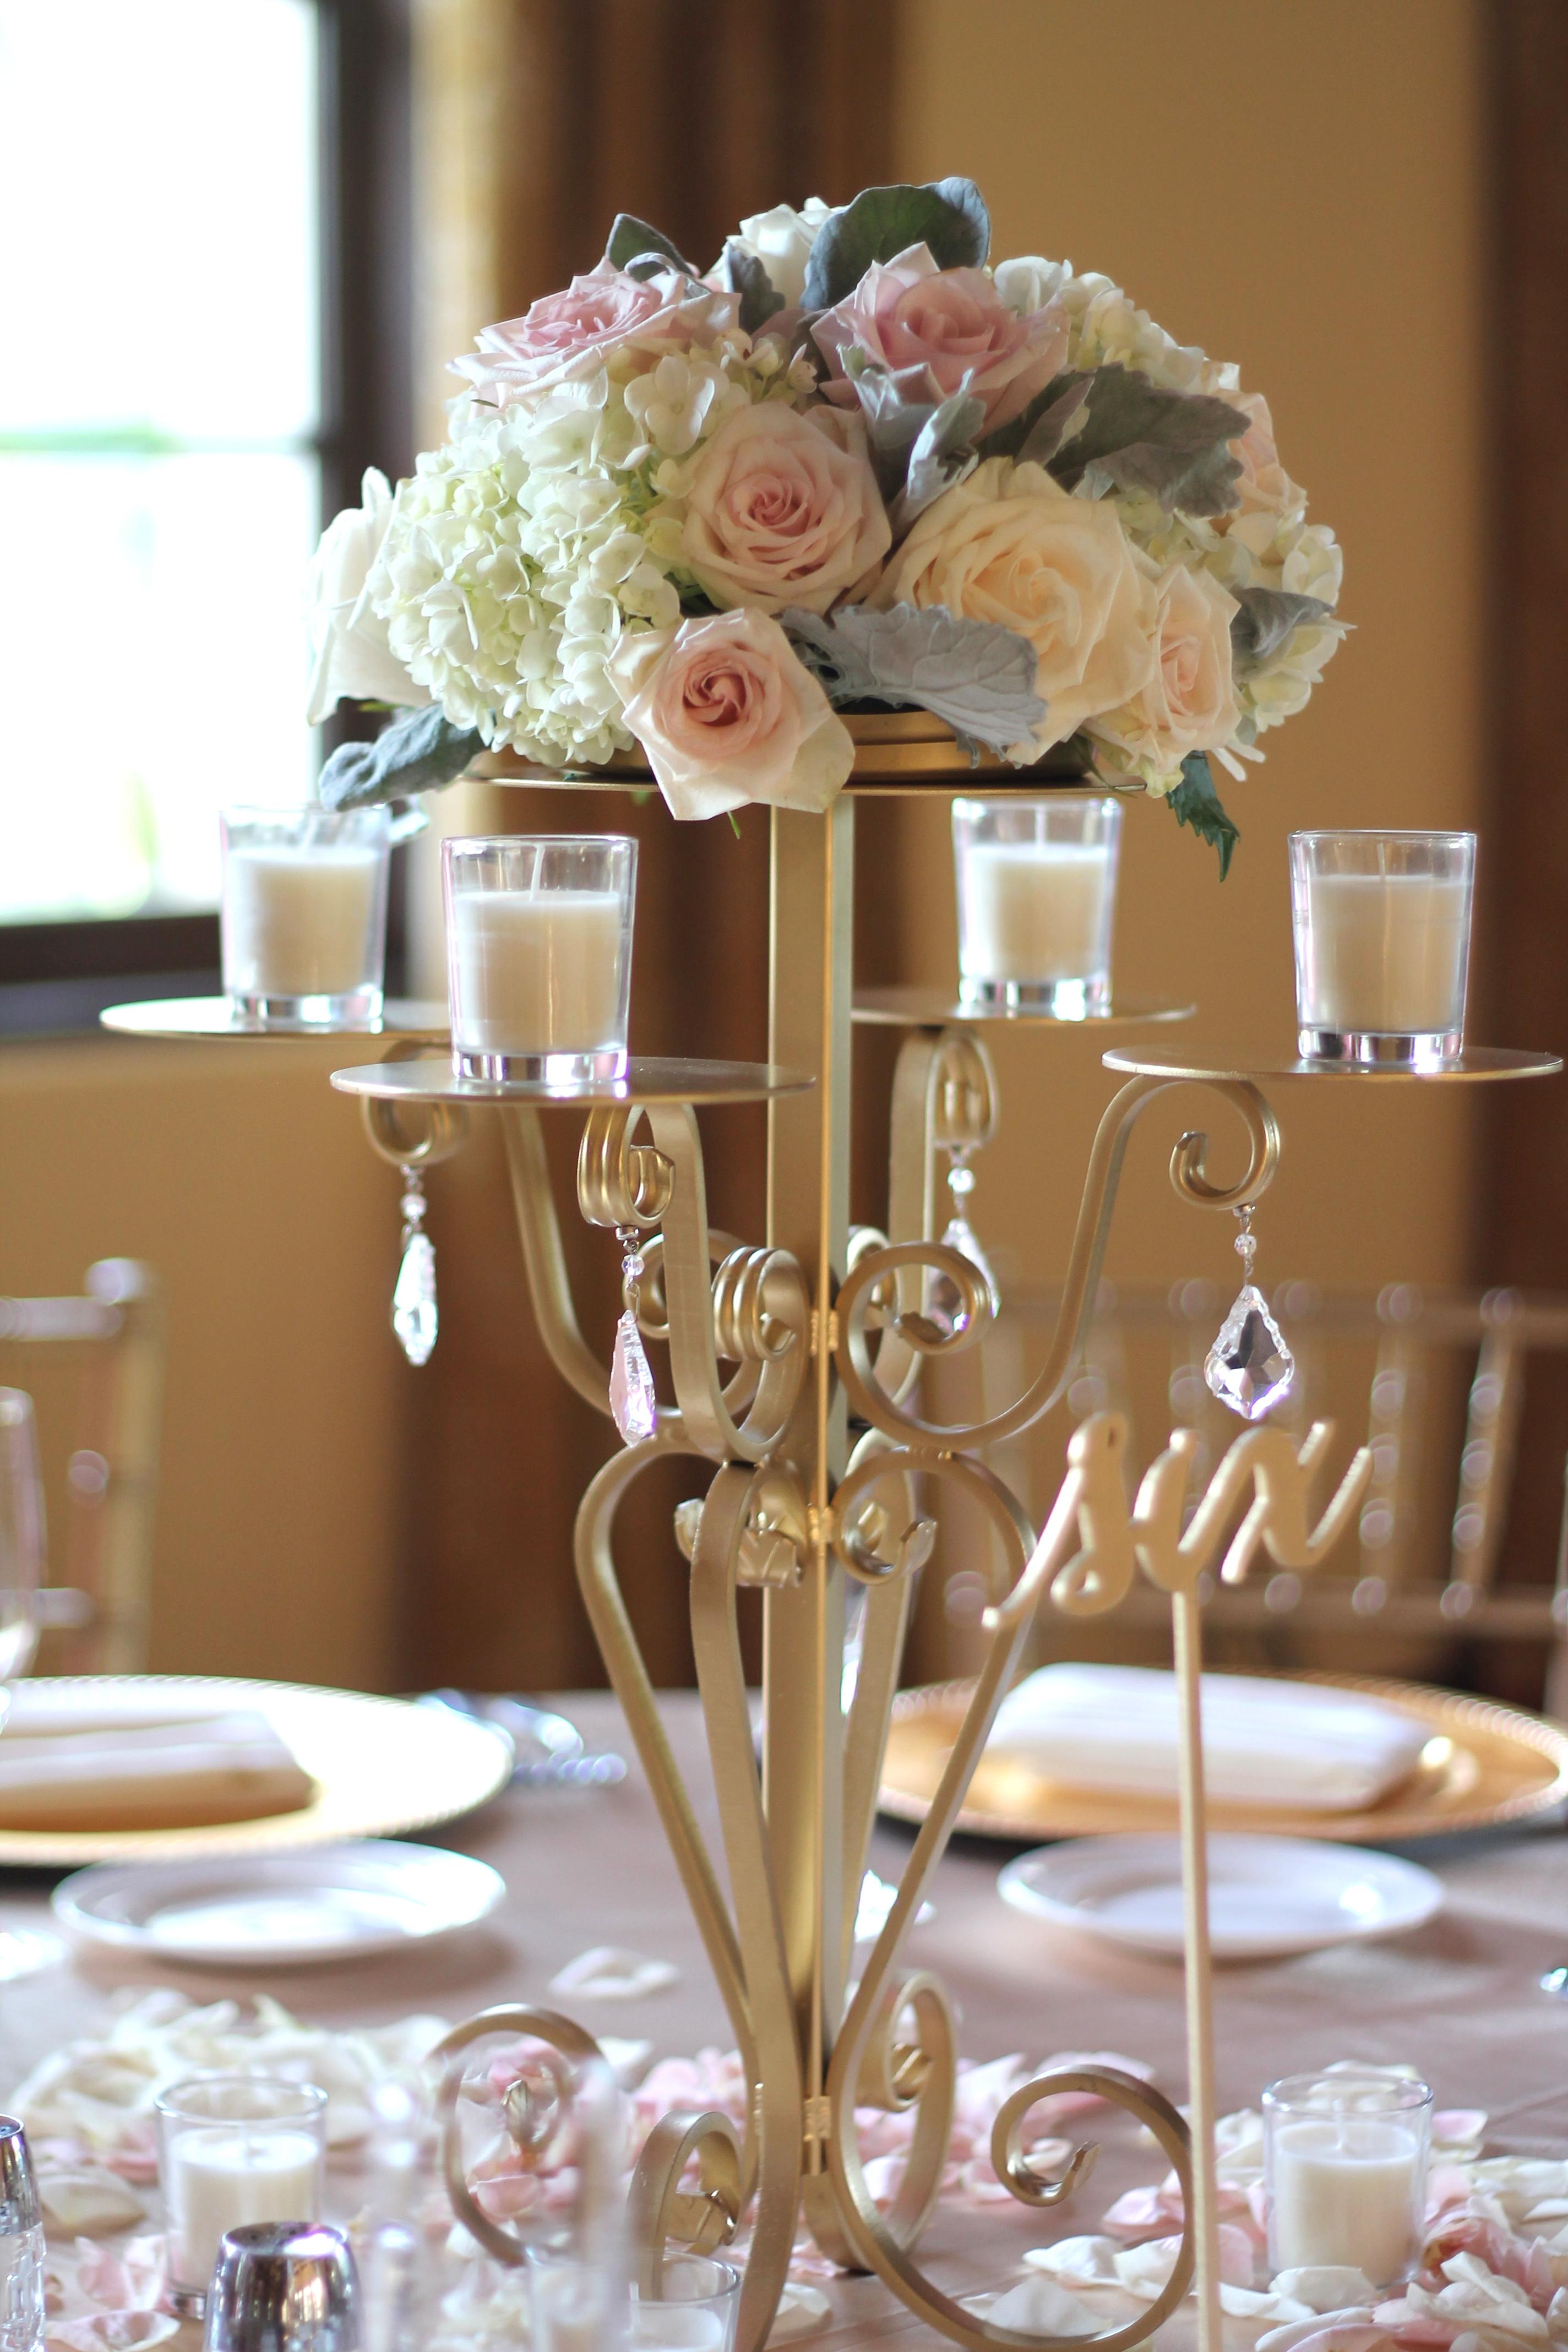 Tuscany Centerpiece Wedding Amp Party Rentals San Diego CA